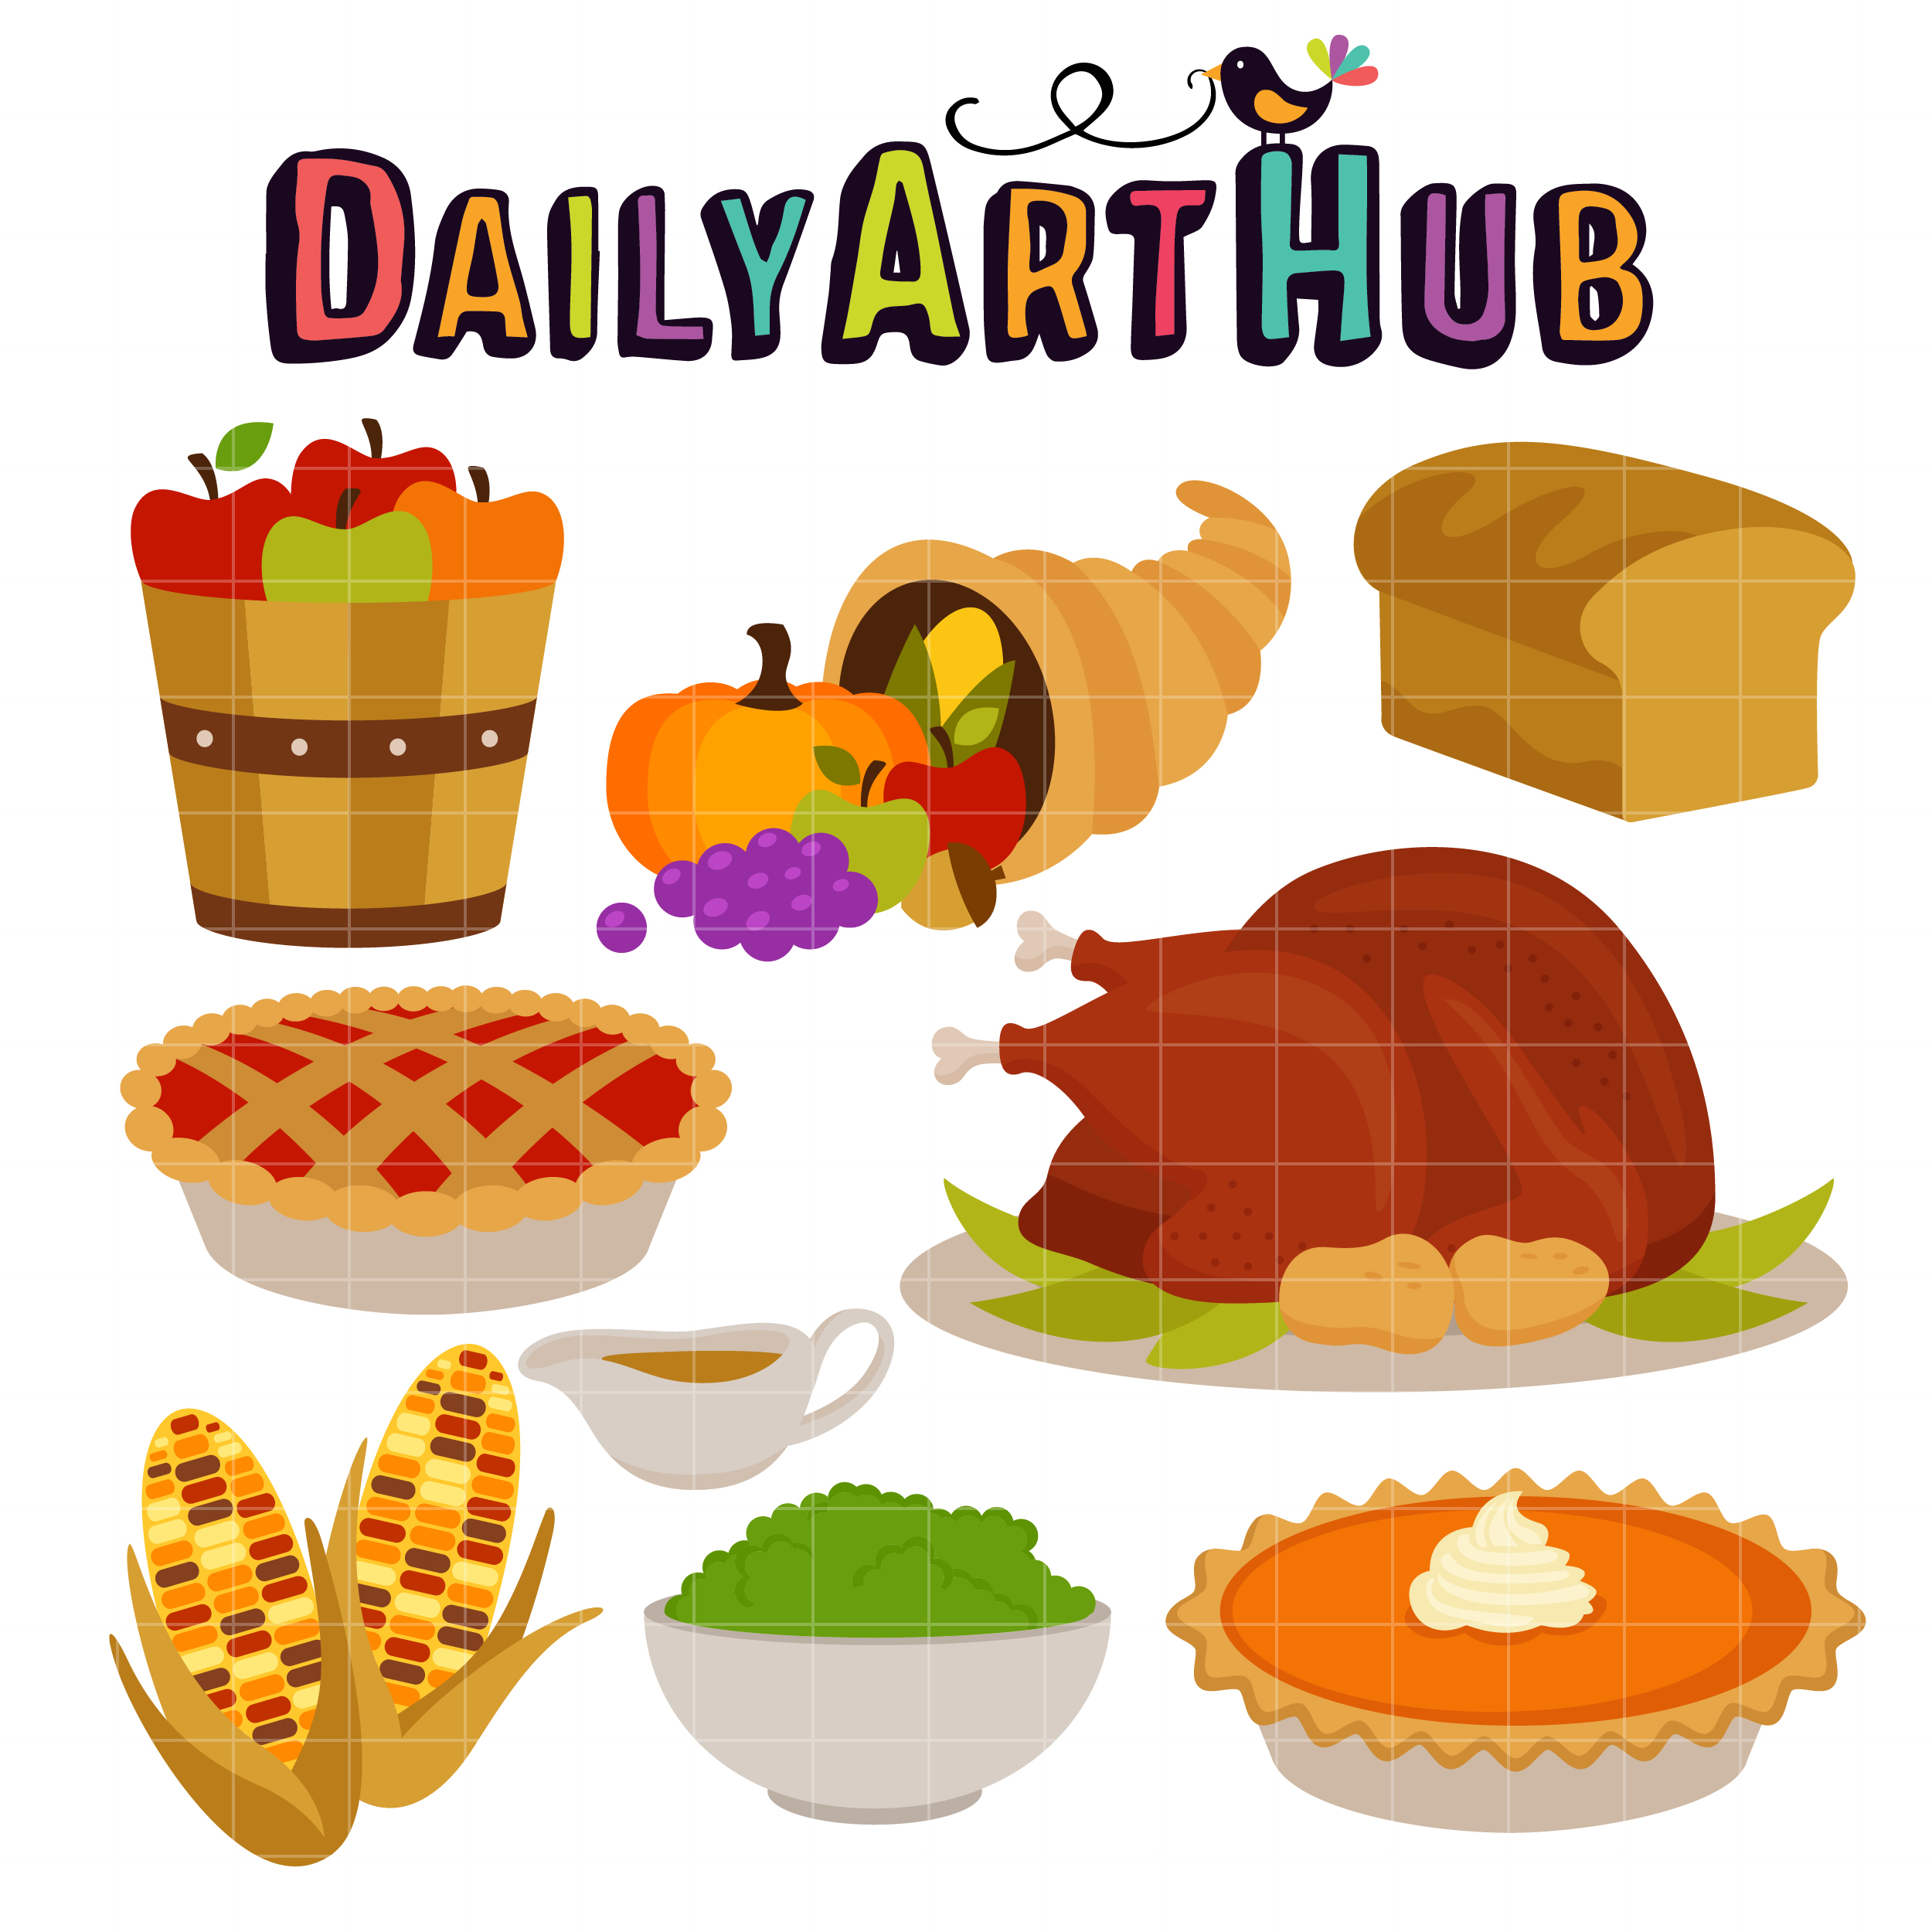 thanksgiving feast clip art set daily art hub free clip art everyday rh dailyarthub com Thanksgiving Feast Border thanksgiving feast clipart images